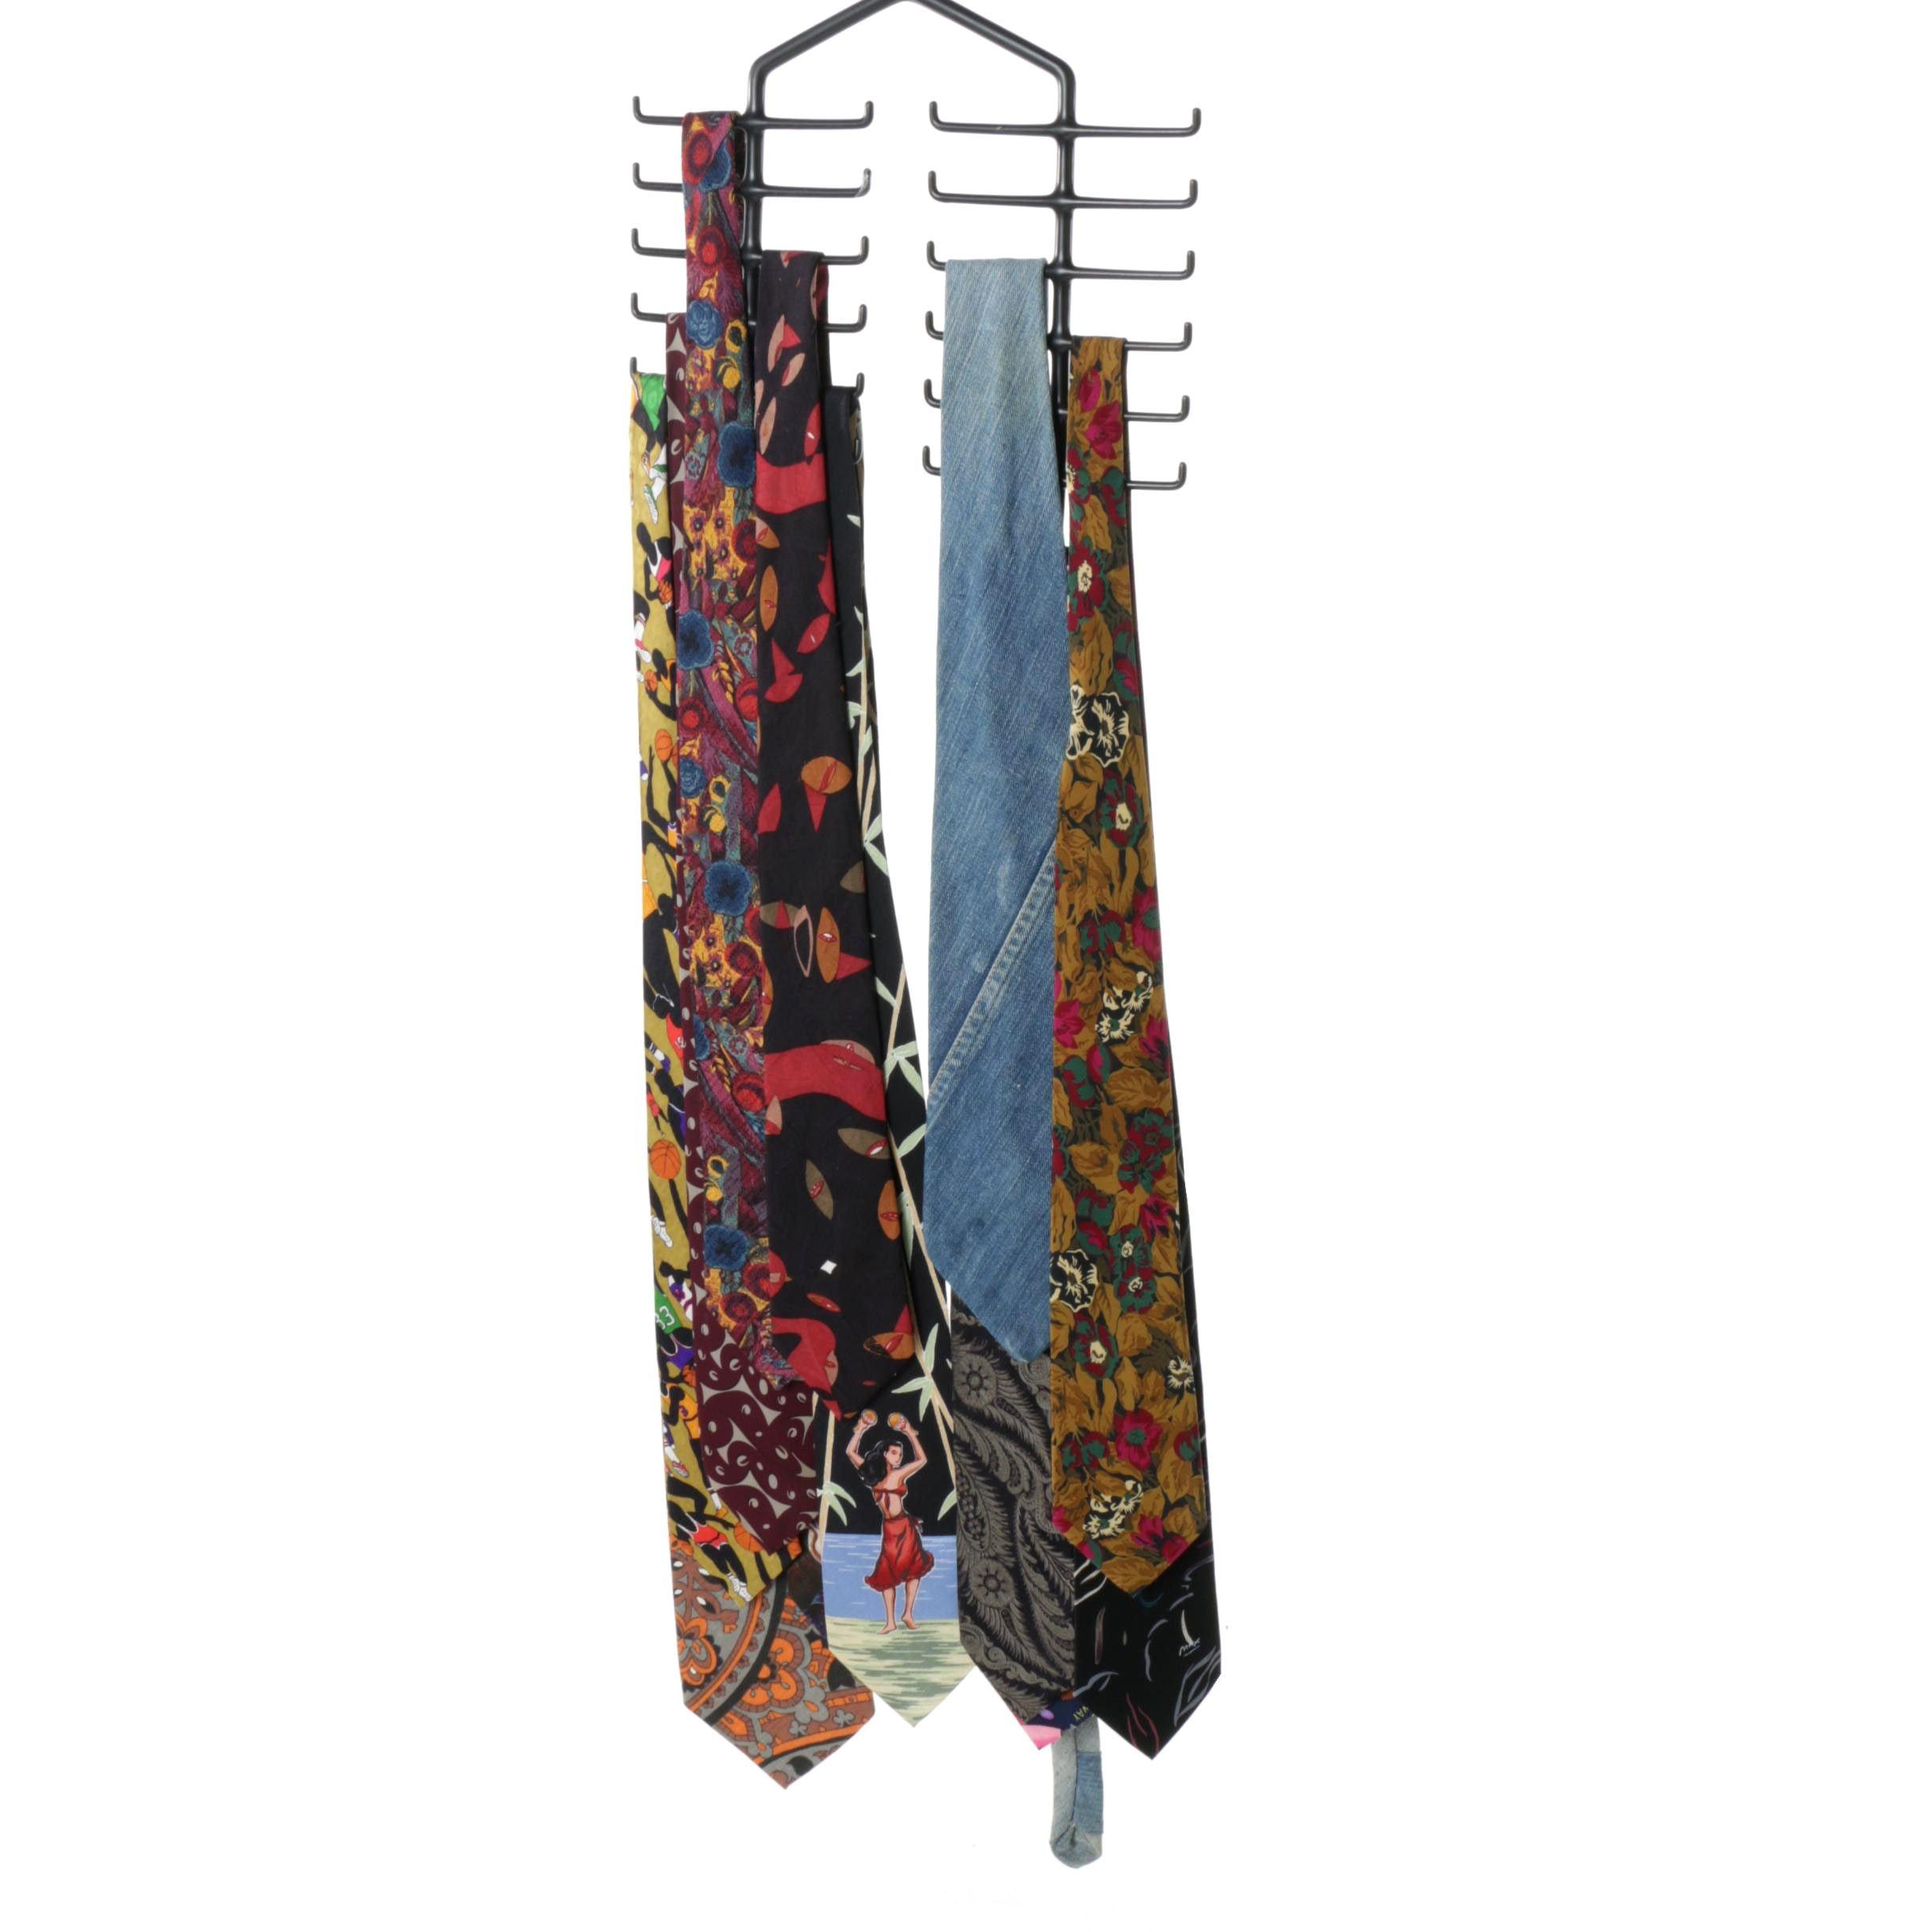 Men's Printed Neckties Including Vintage Nicole Miller